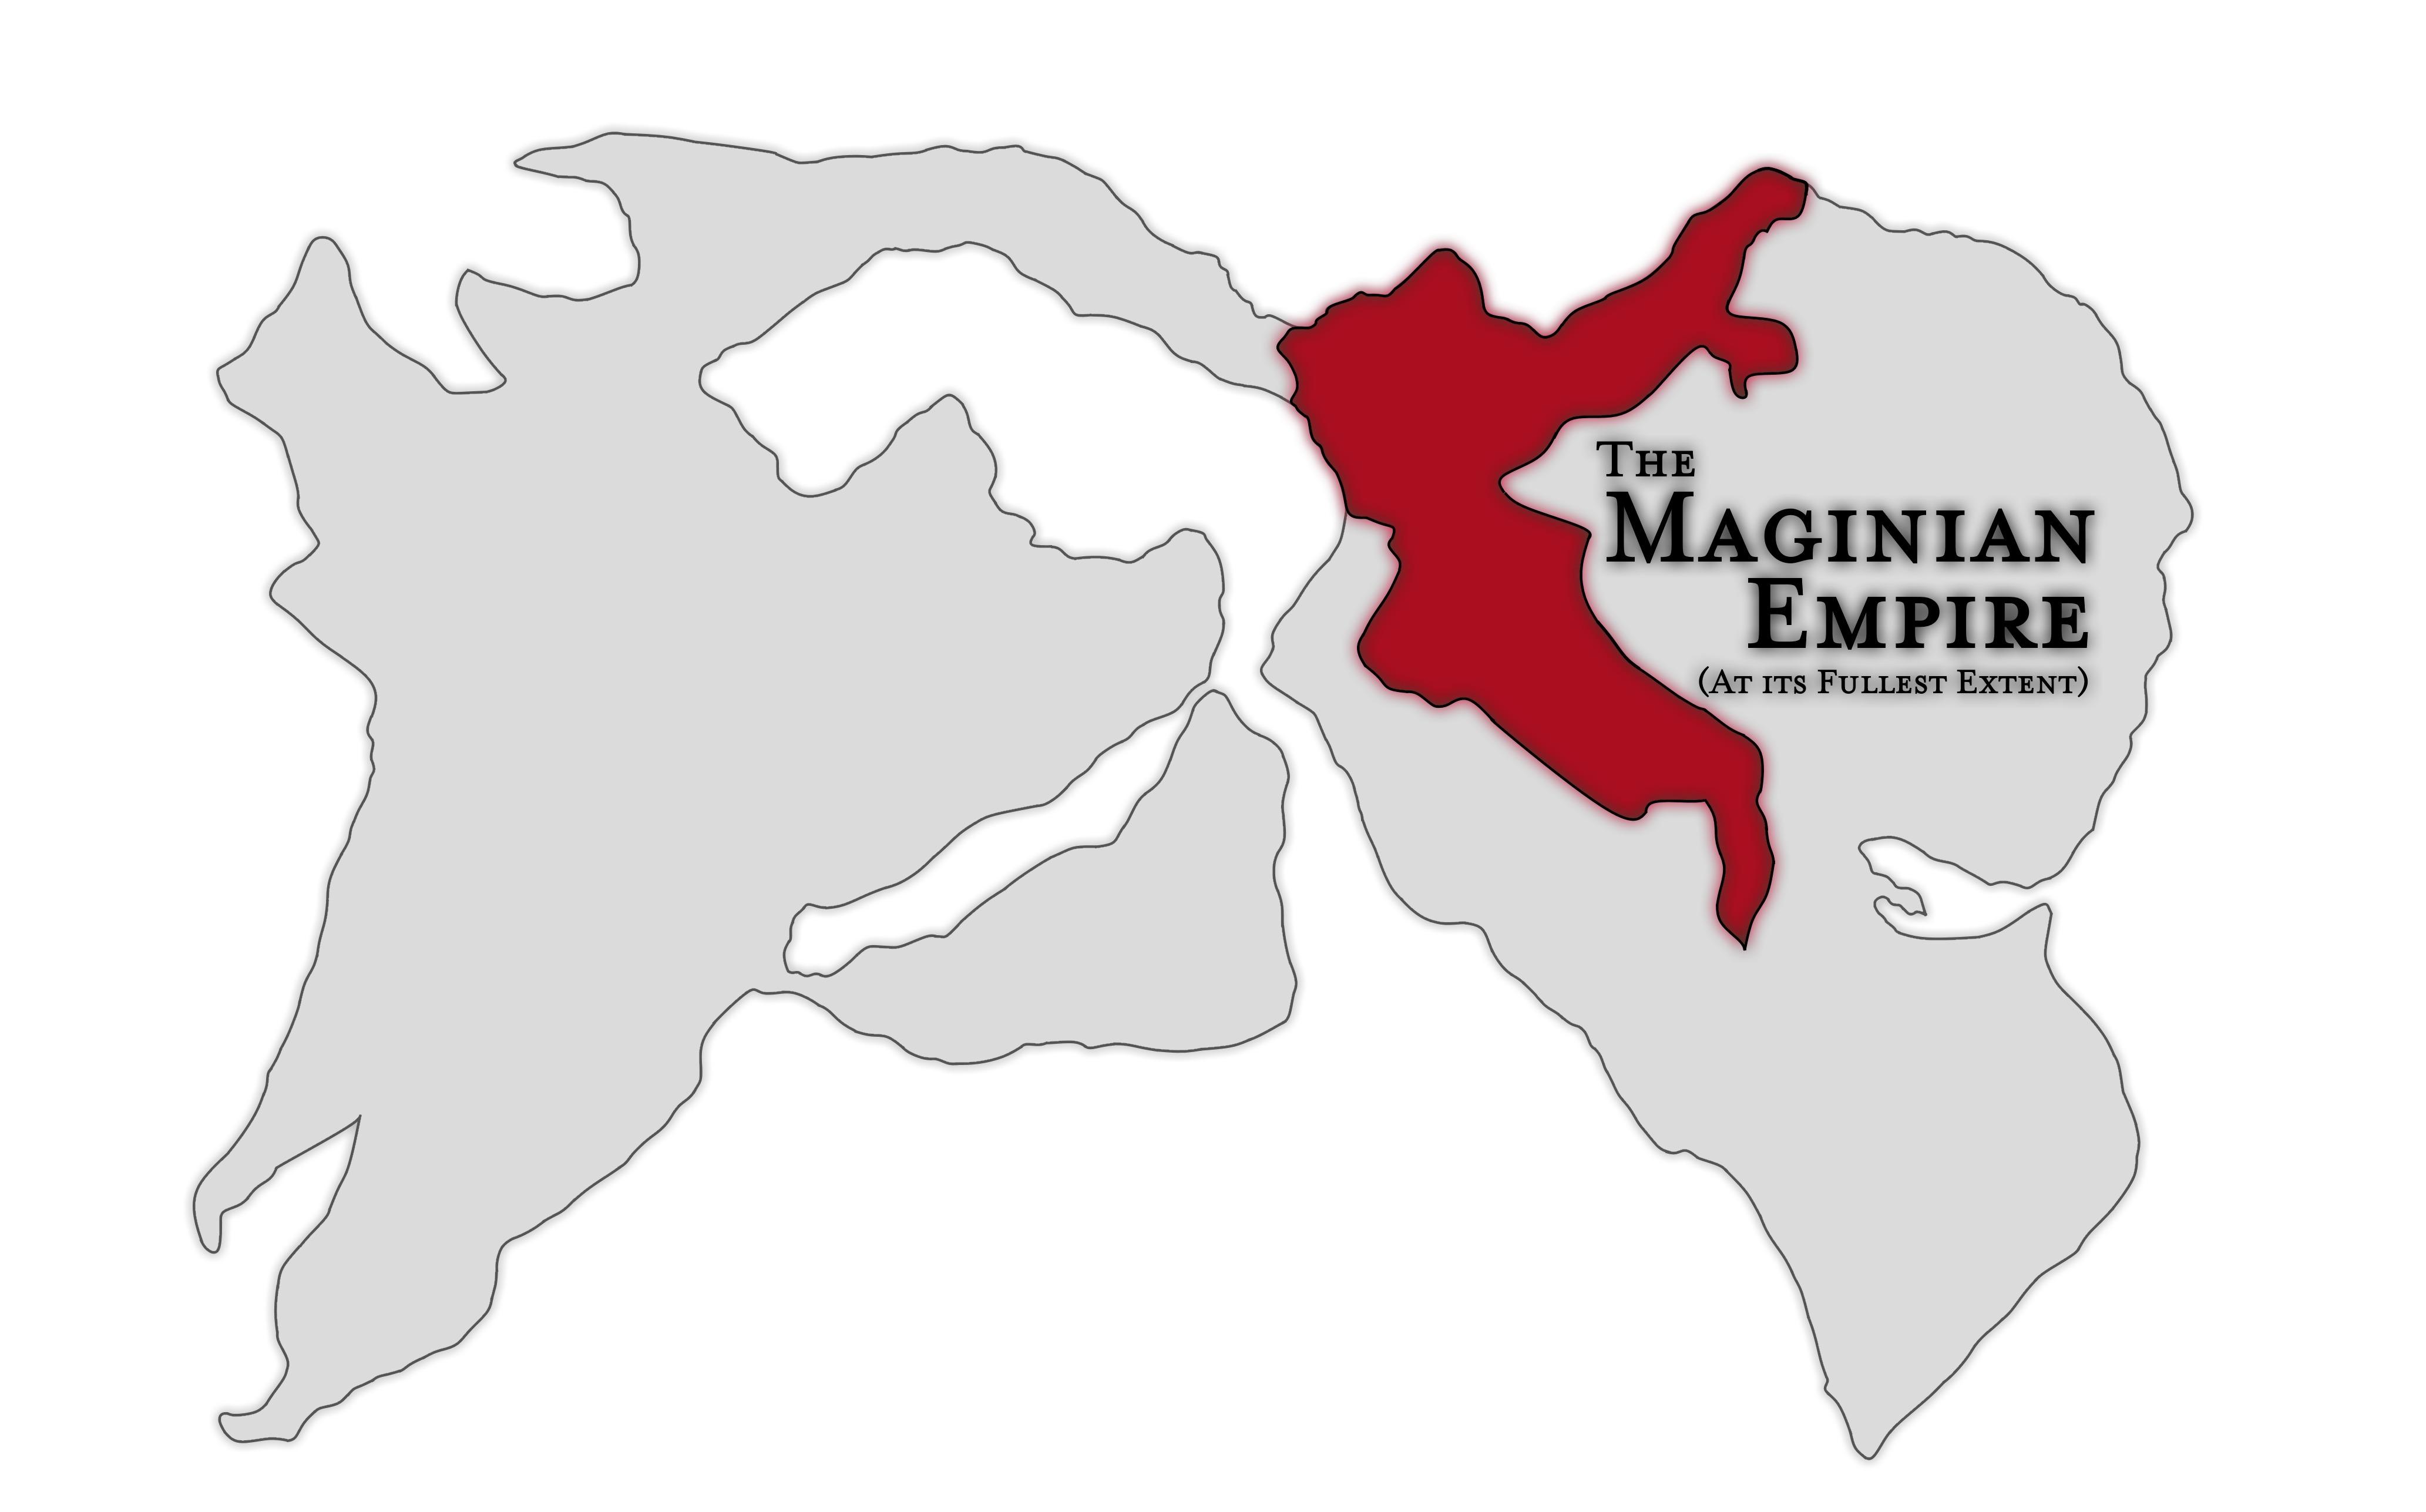 Maginian empire